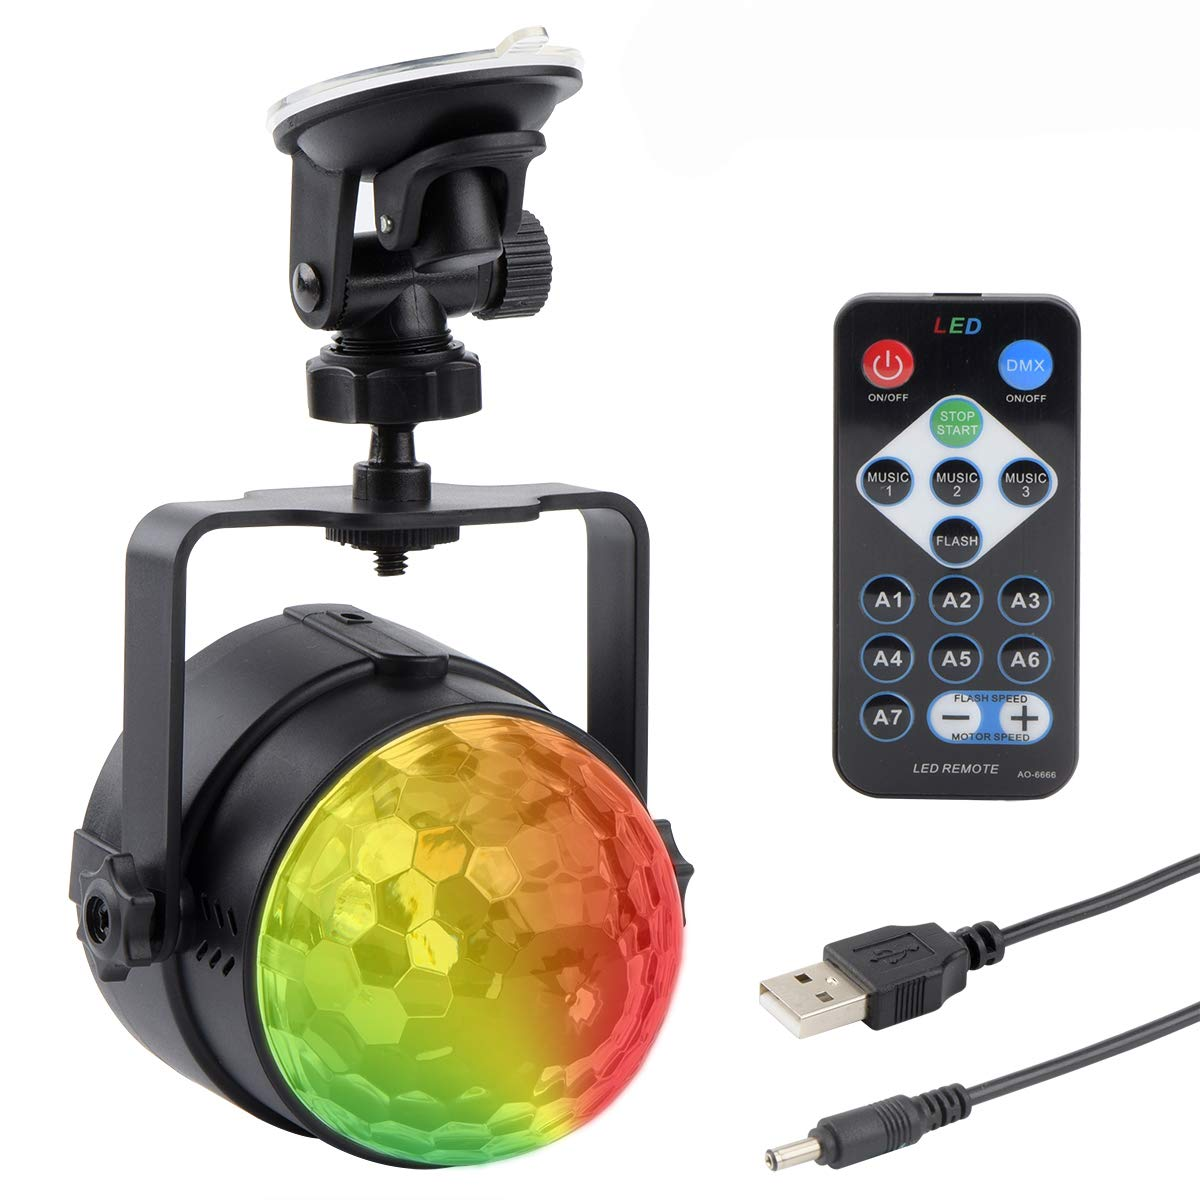 Autai USB Stage Light LED Disco Light Ball Music Rhythm RGB Multi Color Change Strobe DJ Light for Festival Birthday Home Party Bar Club Xmas with Remote Controller